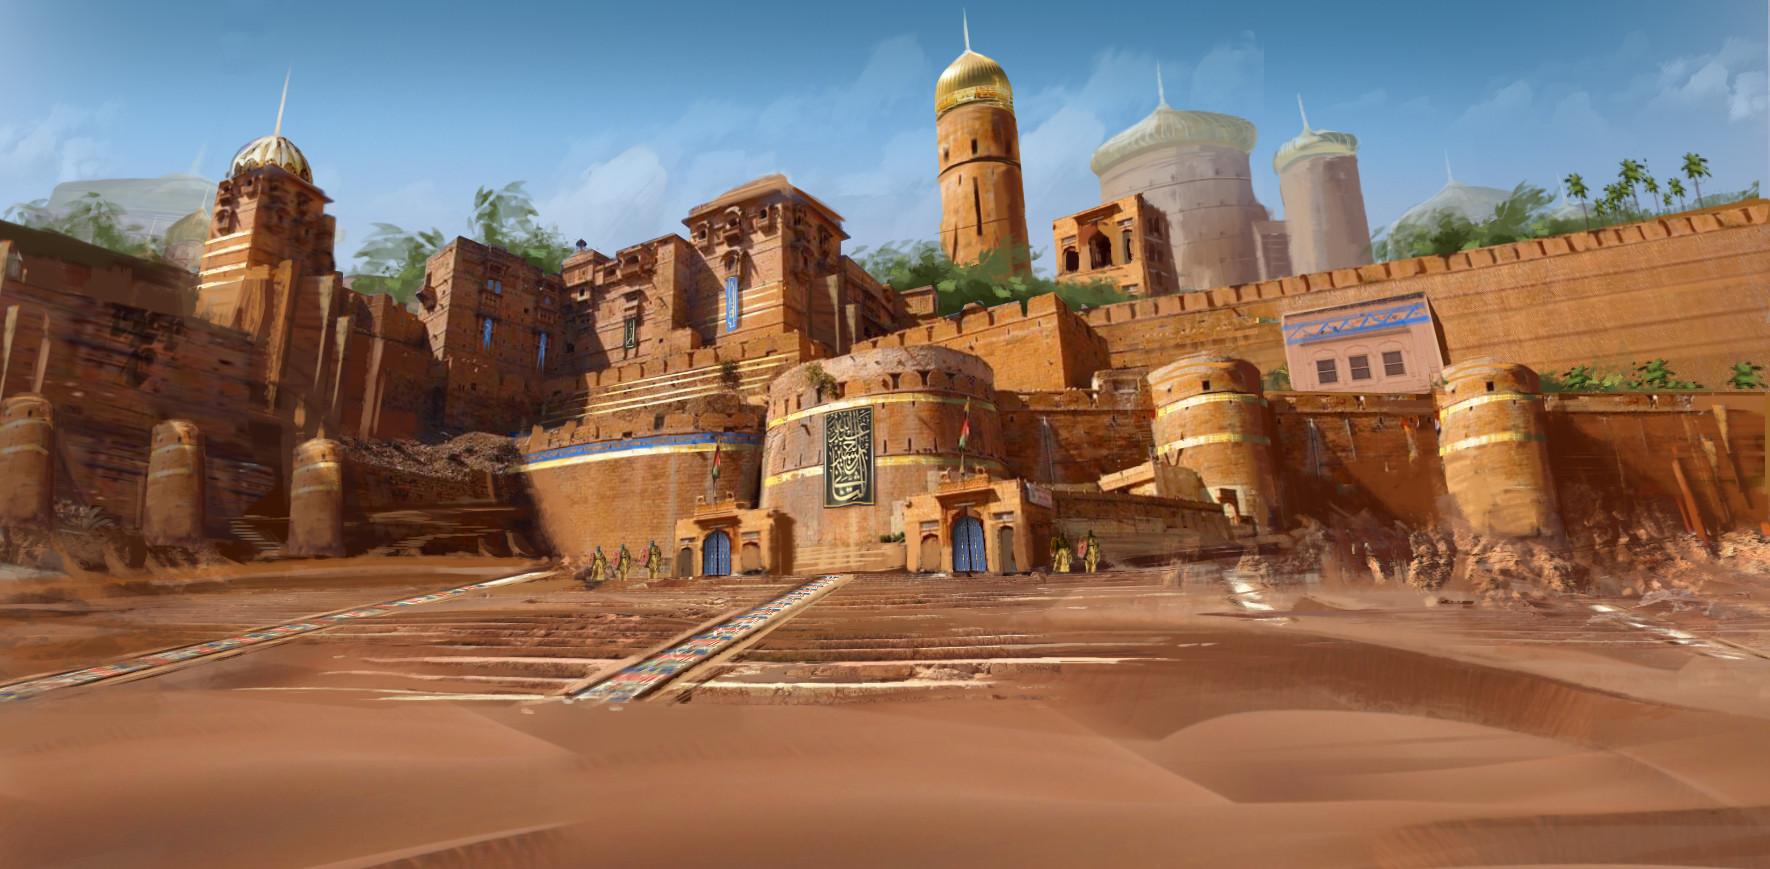 View City Desert Concept Art Background